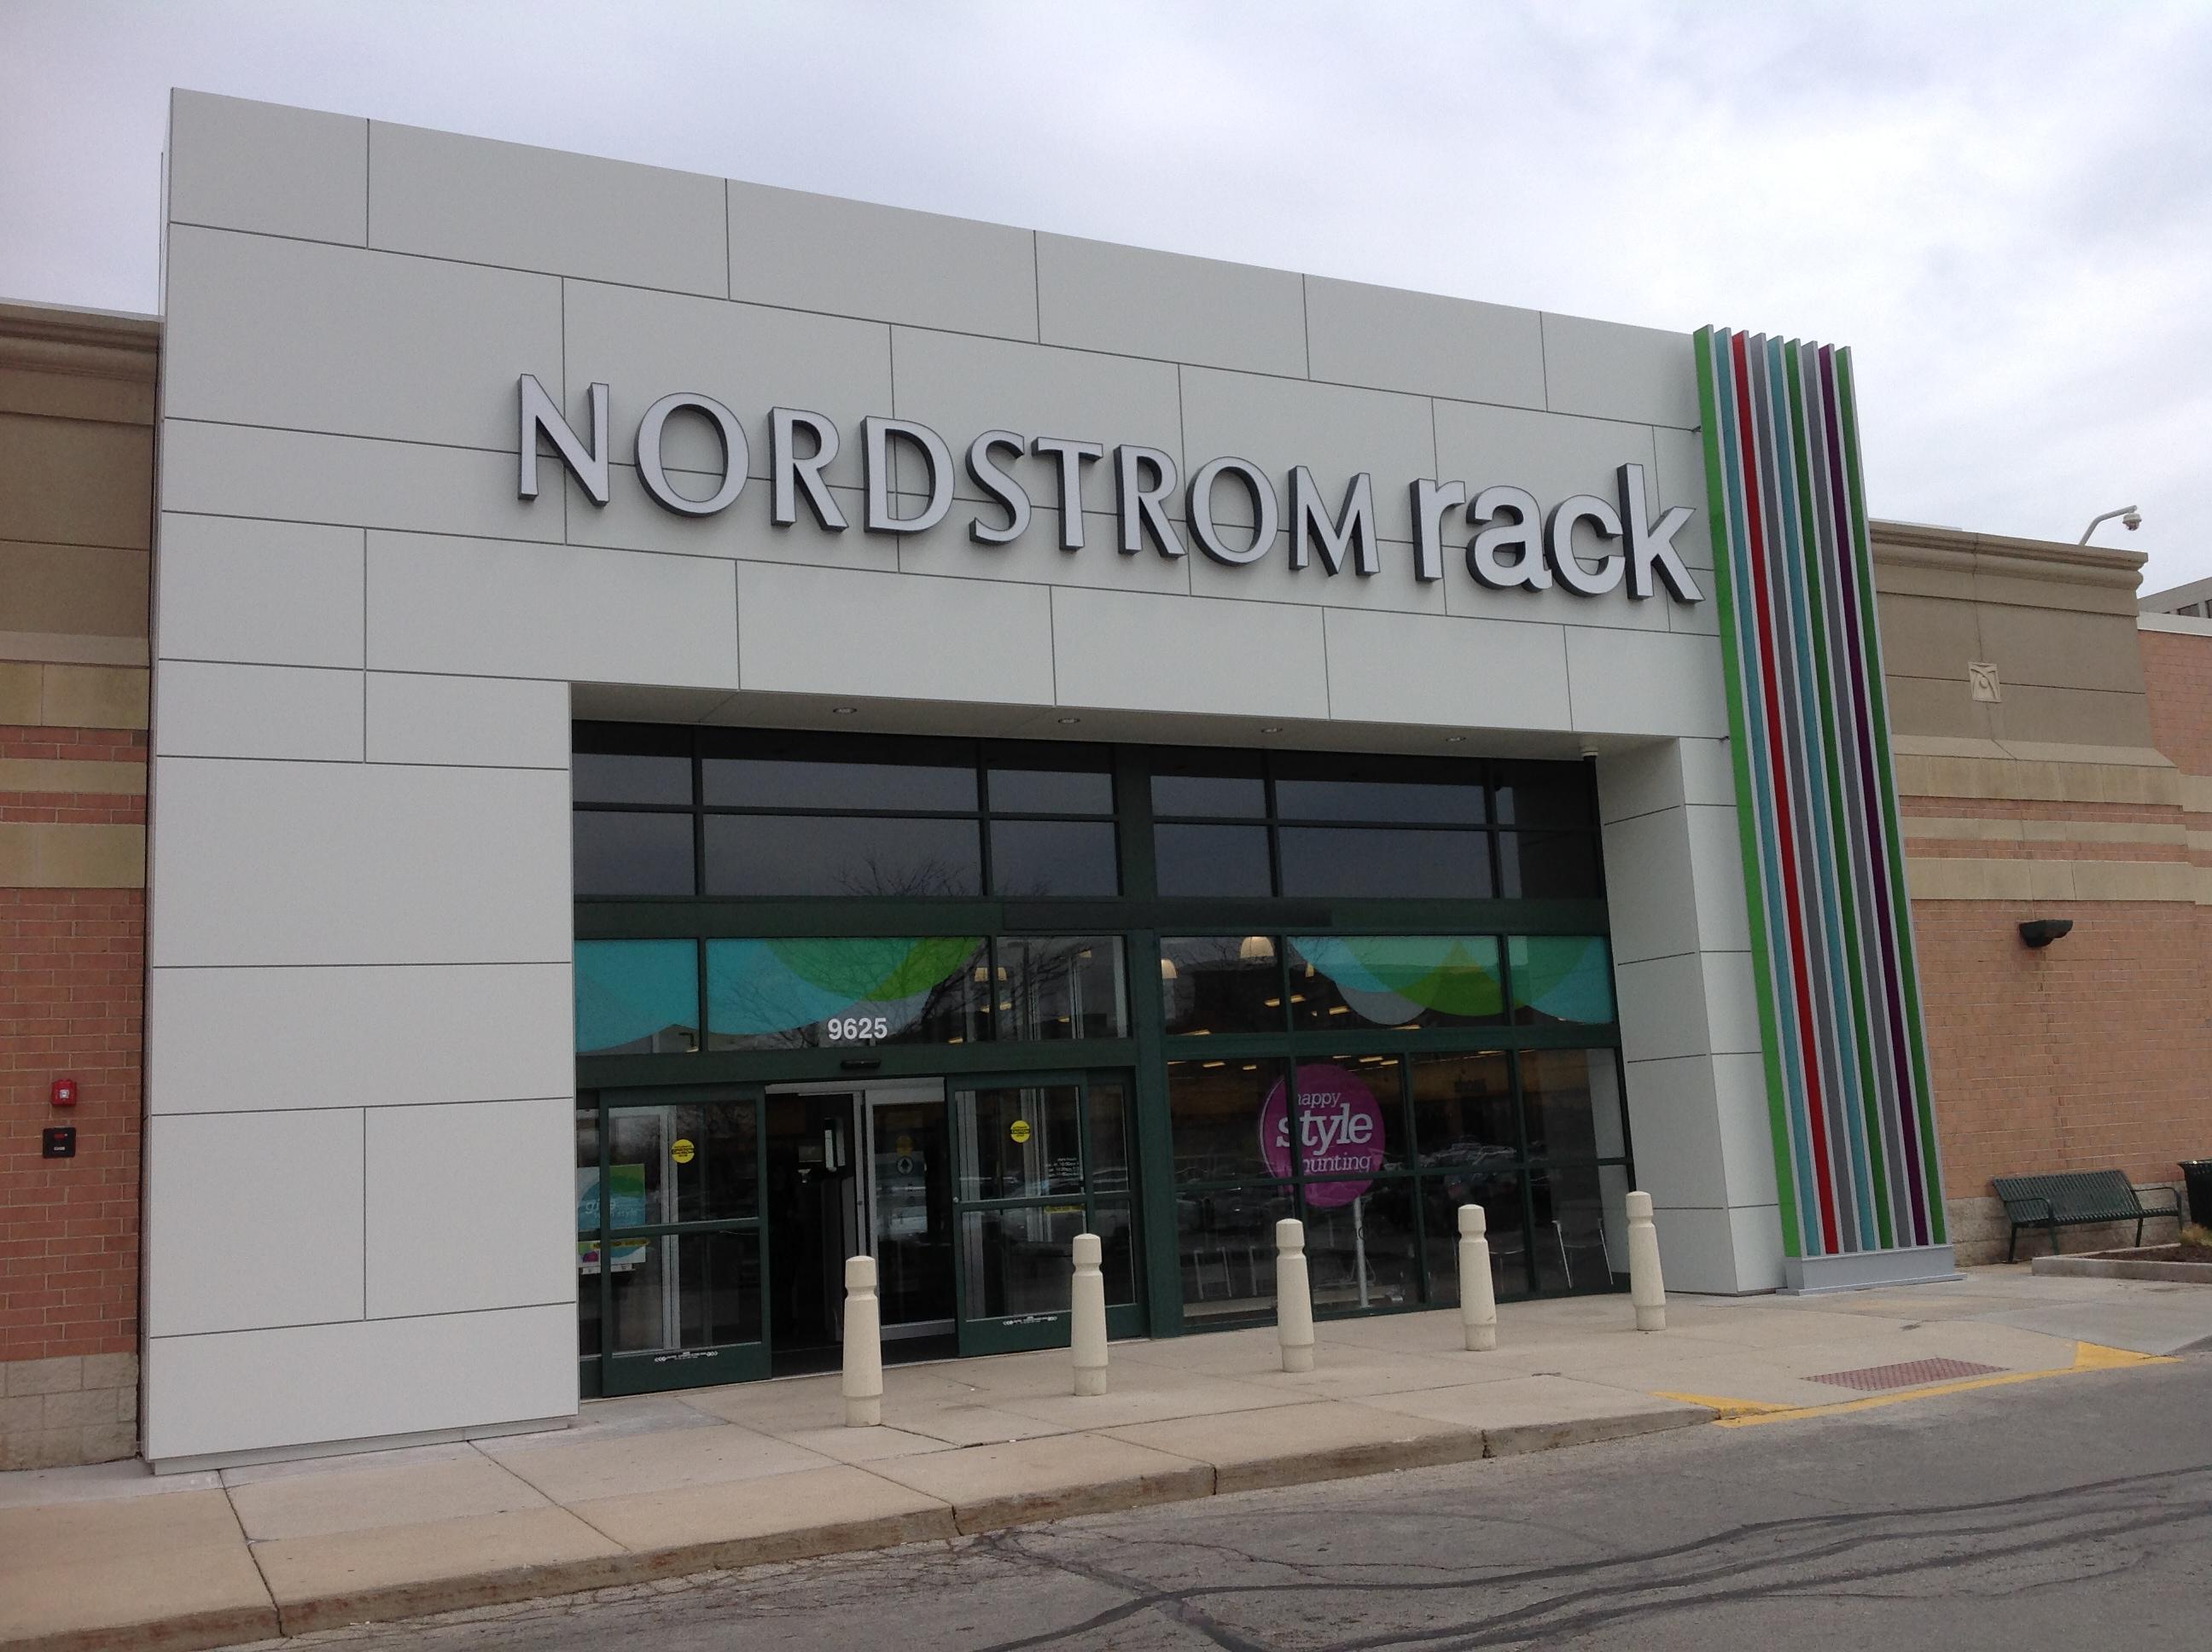 Stokie Nordstrom Rack (Stokie)